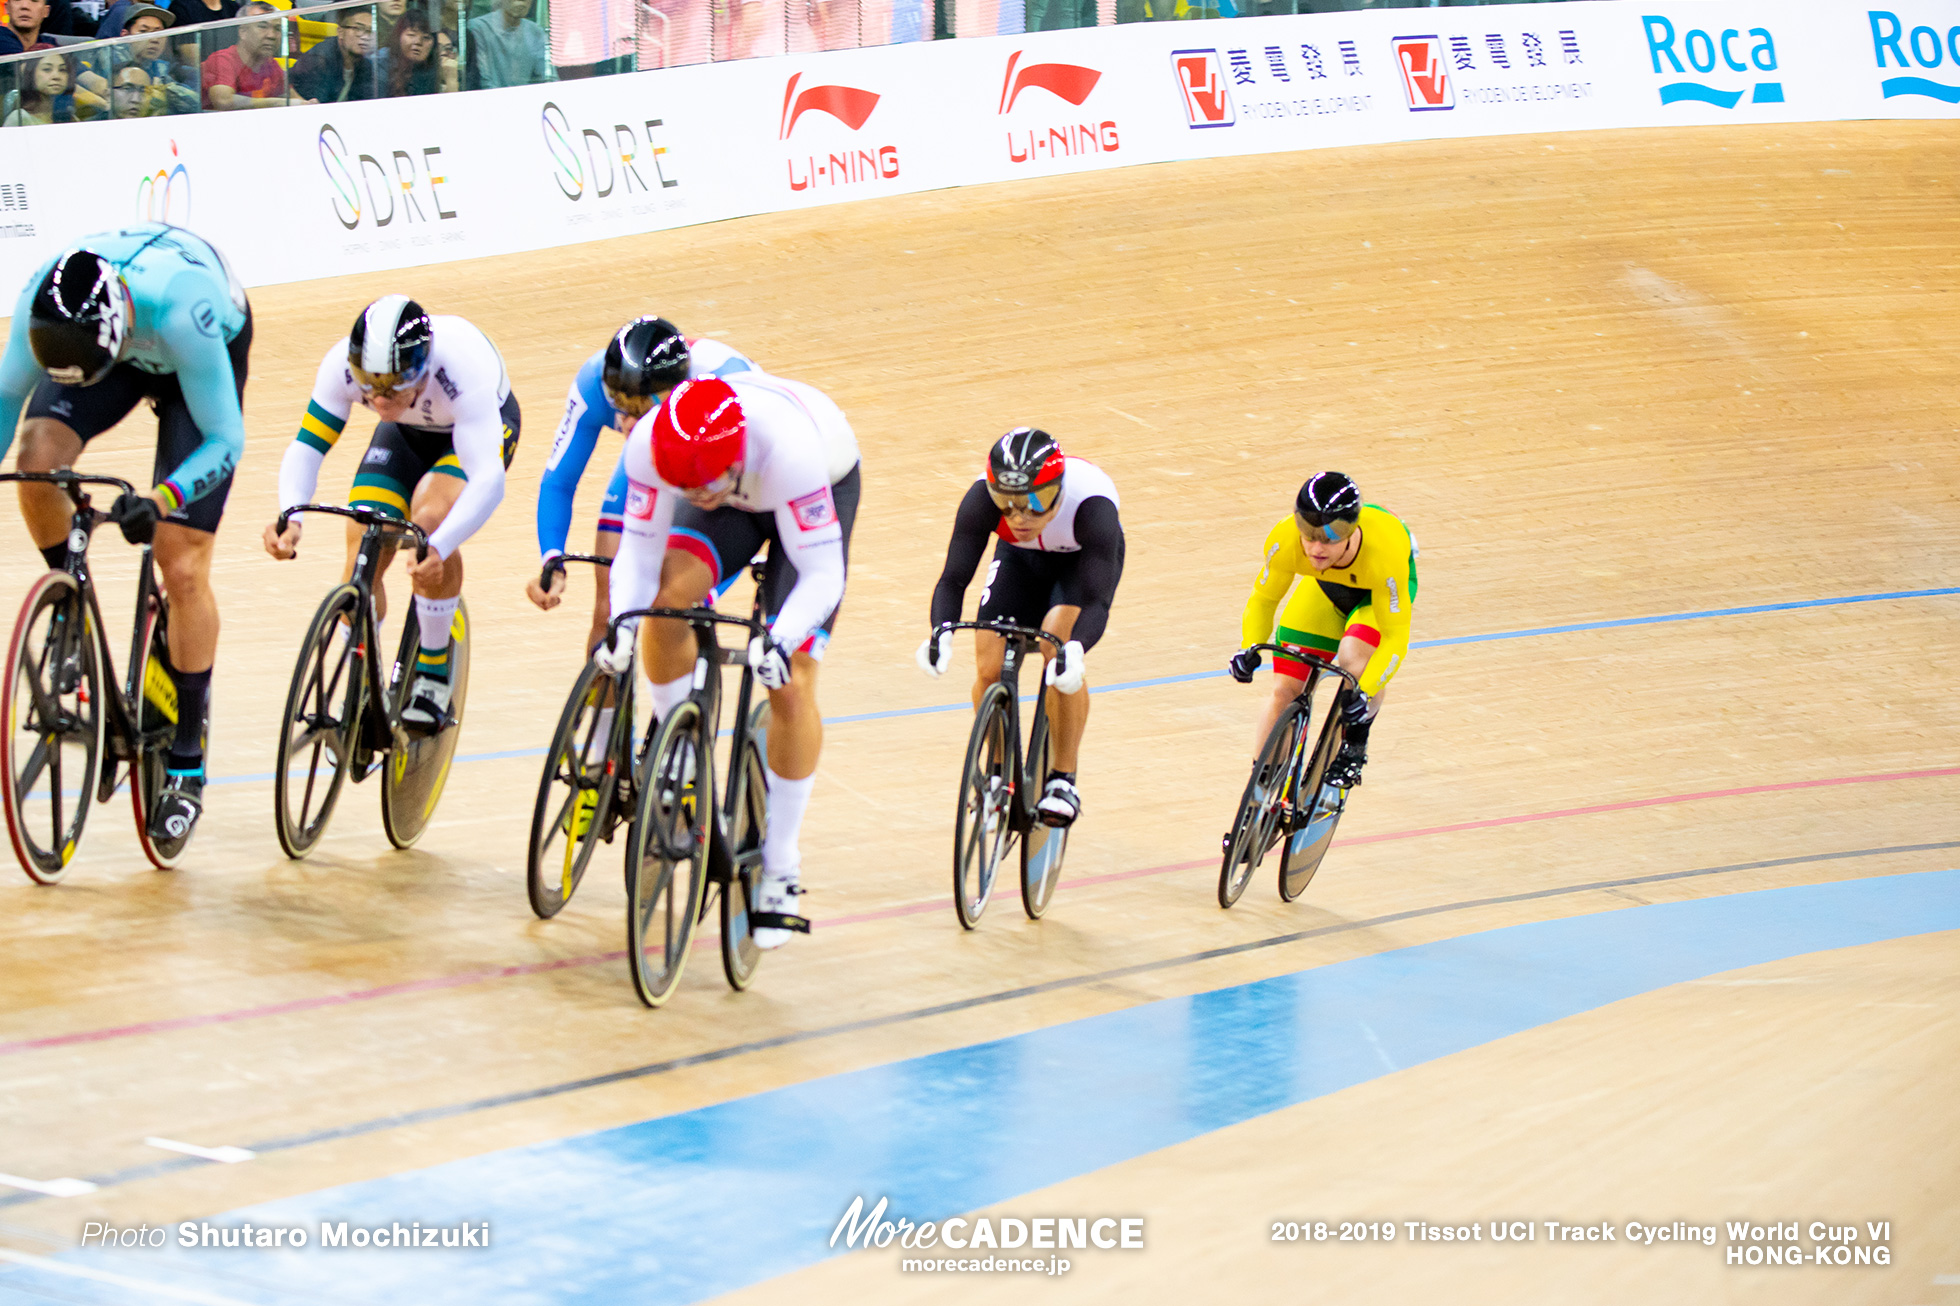 2nd Round / Men's Keirin / Track Cycling World Cup VI / Hong-Kong